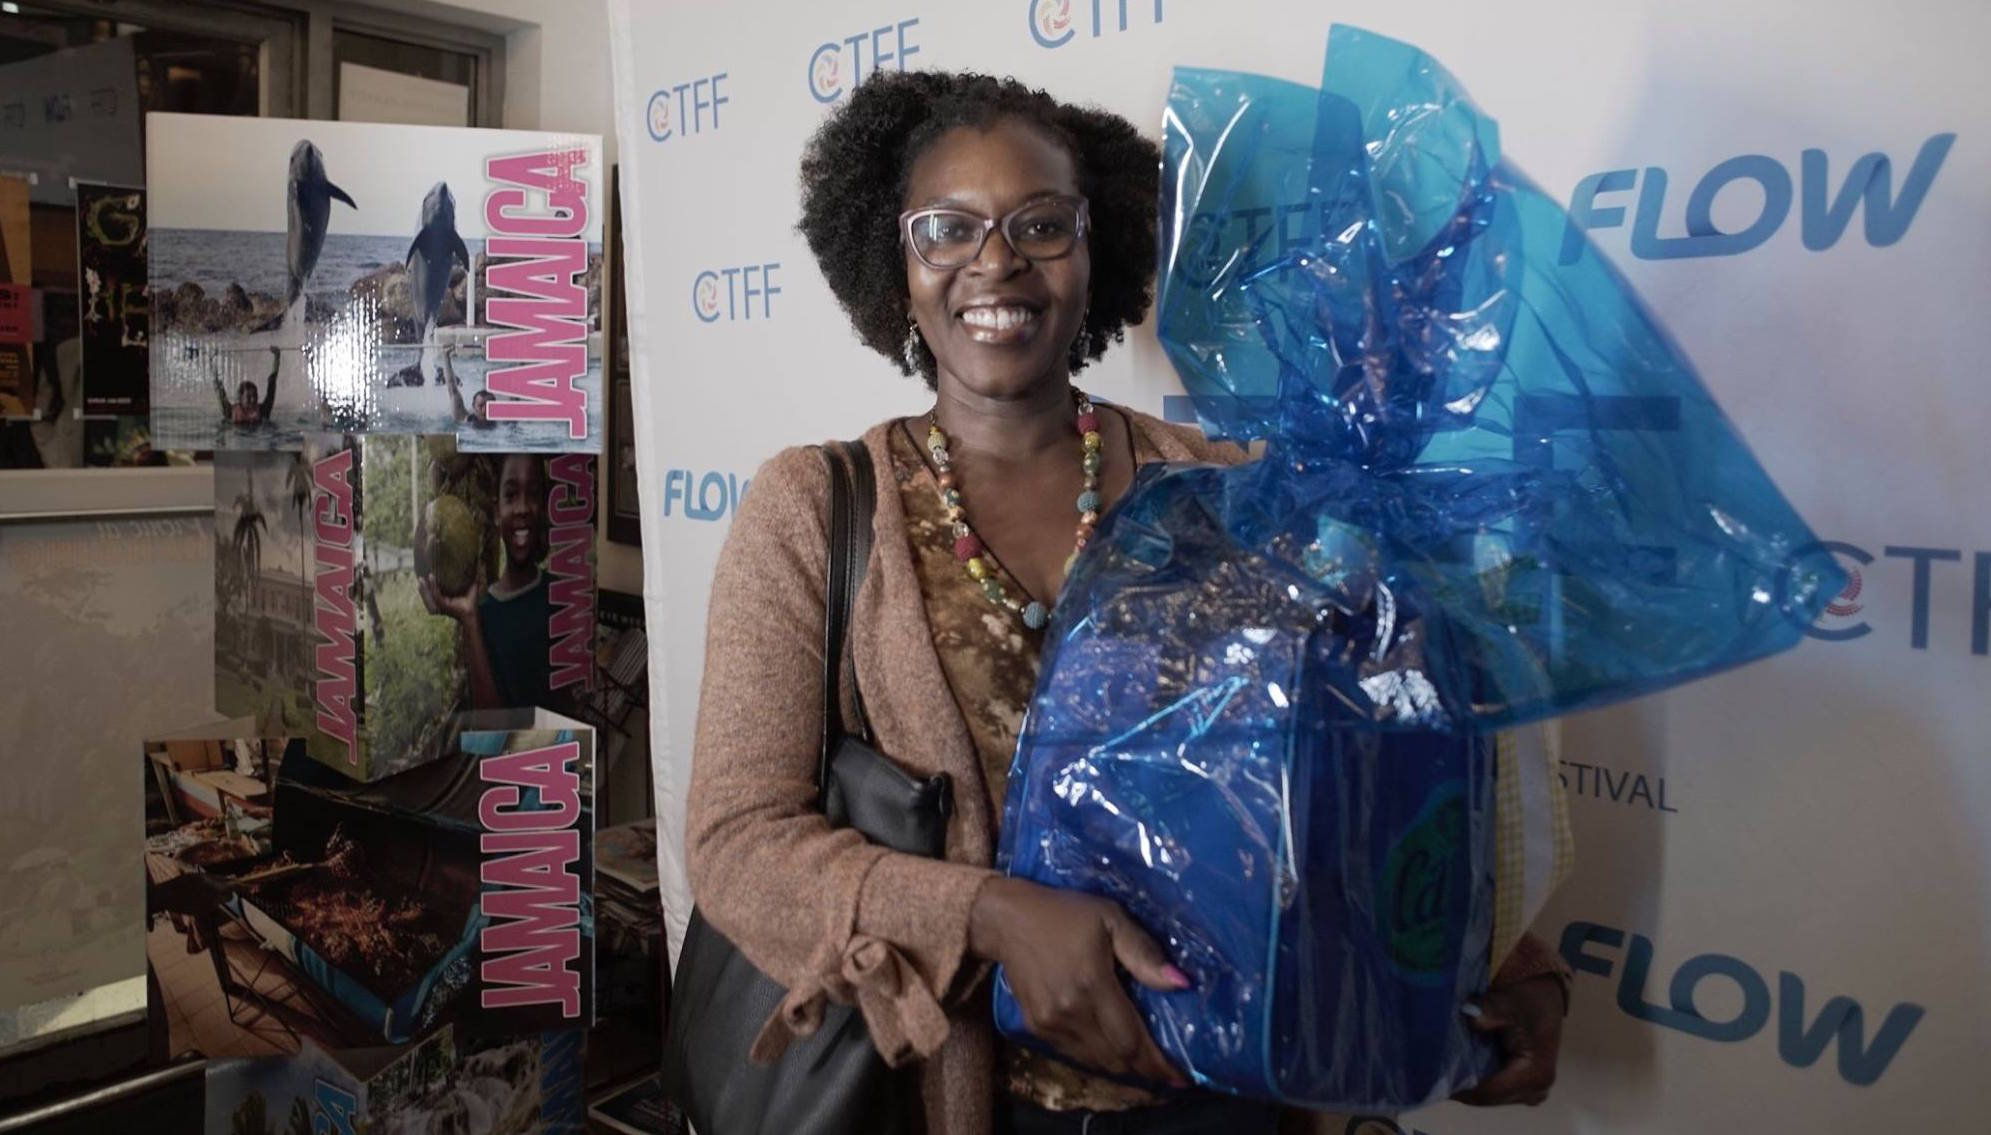 CTFF award winner